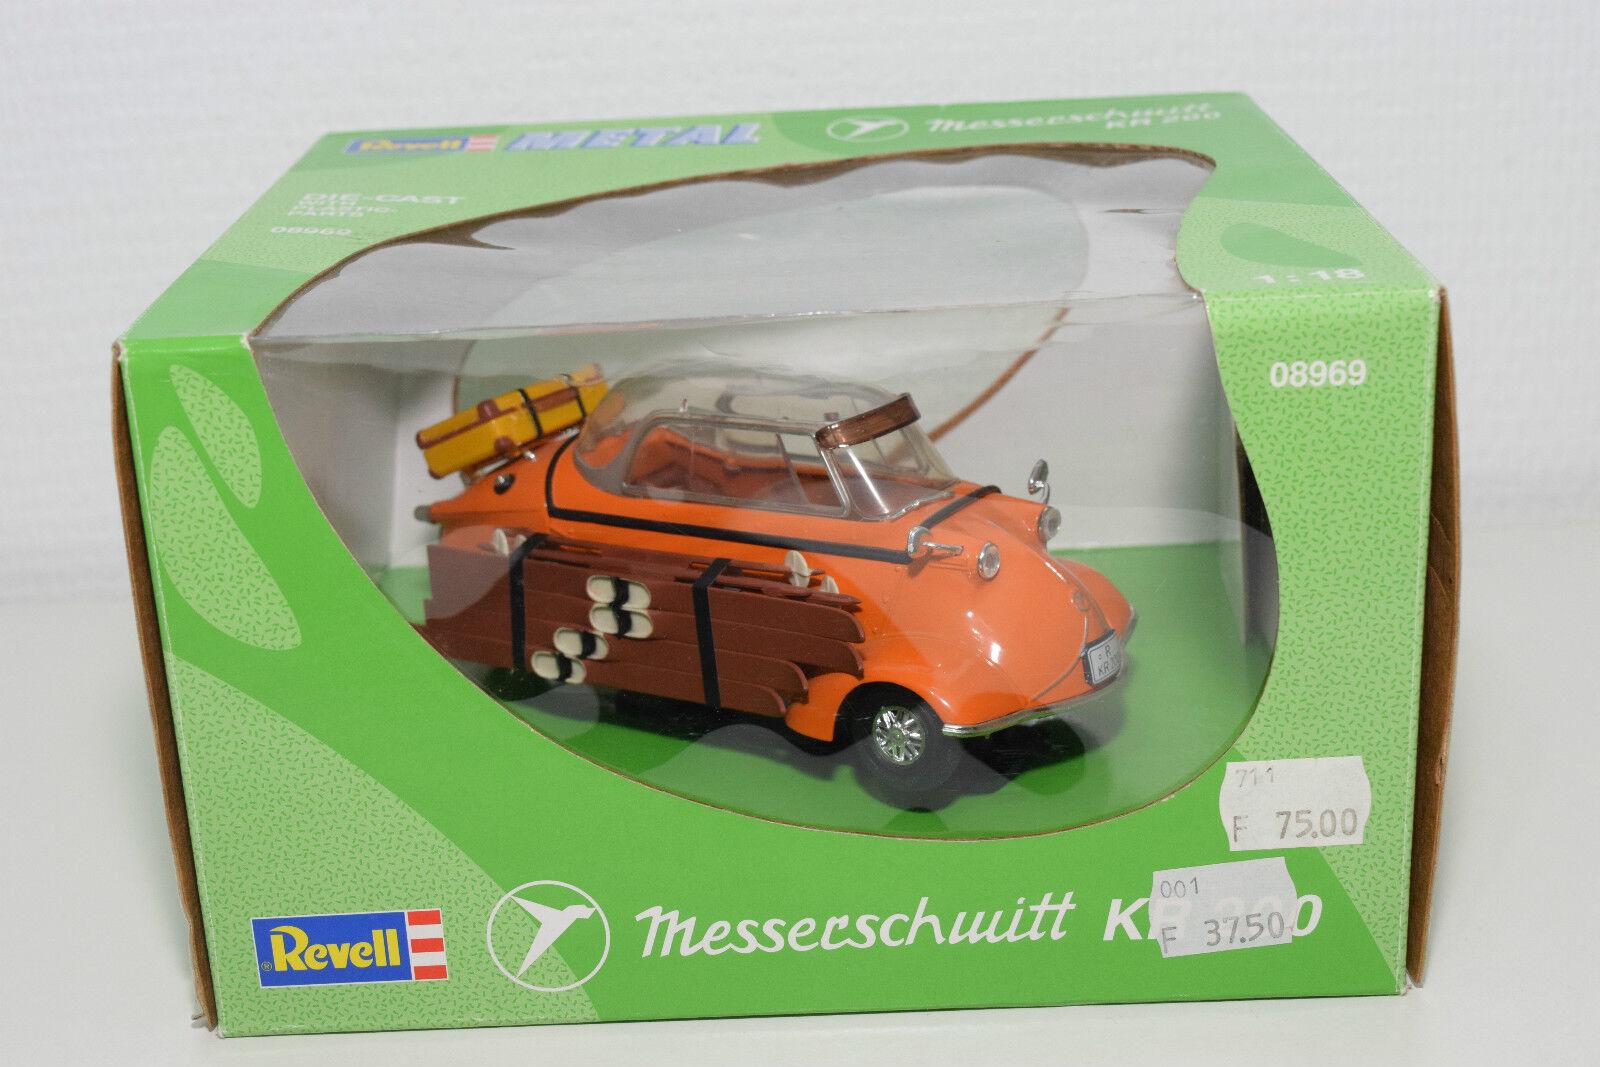 REVELL 1 18 8969 08969 MESSERSCHMITT KR200 KR 200 WITH SKI Orange MINTBOXED RARE